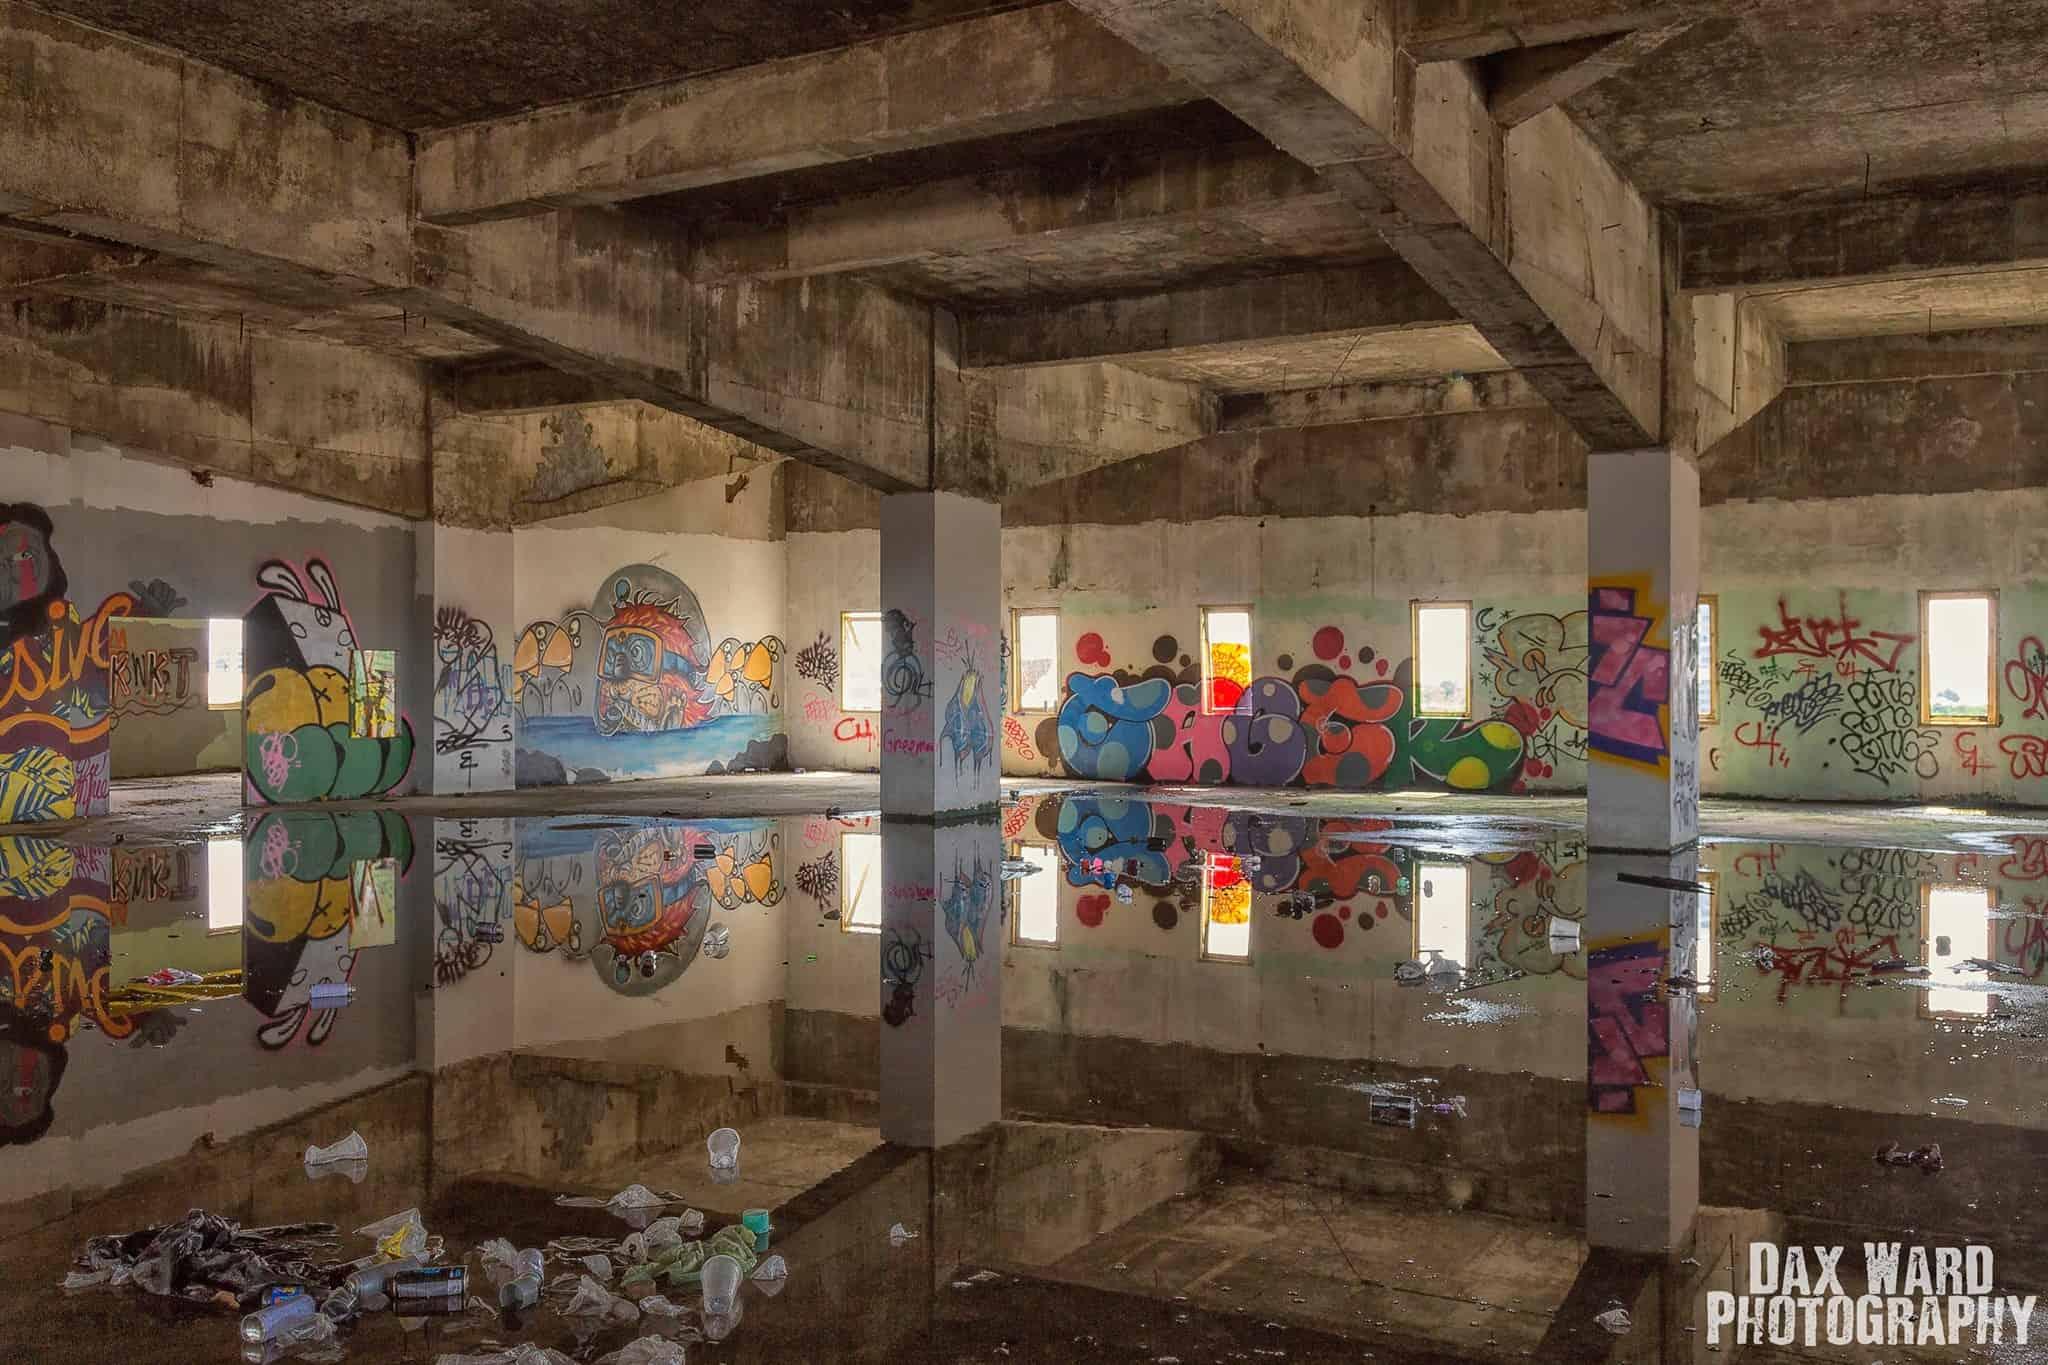 JAM - Abandonia - Photography Exhibition of Dax Ward